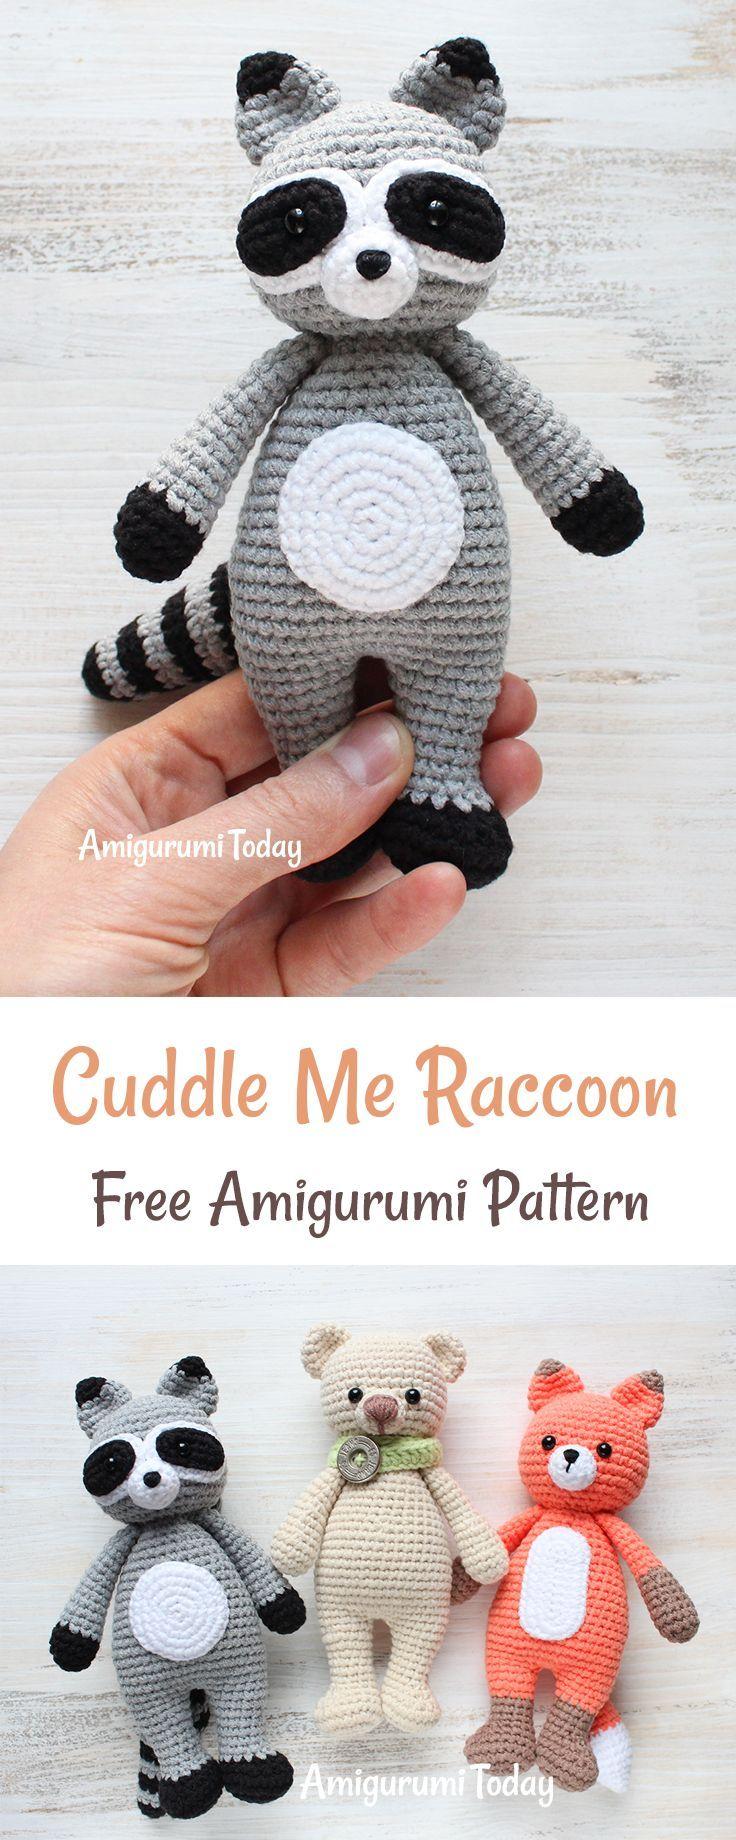 Cuddle Me Raccoon amigurumi pattern | Gehäkelte tiere, Amigurumi und ...